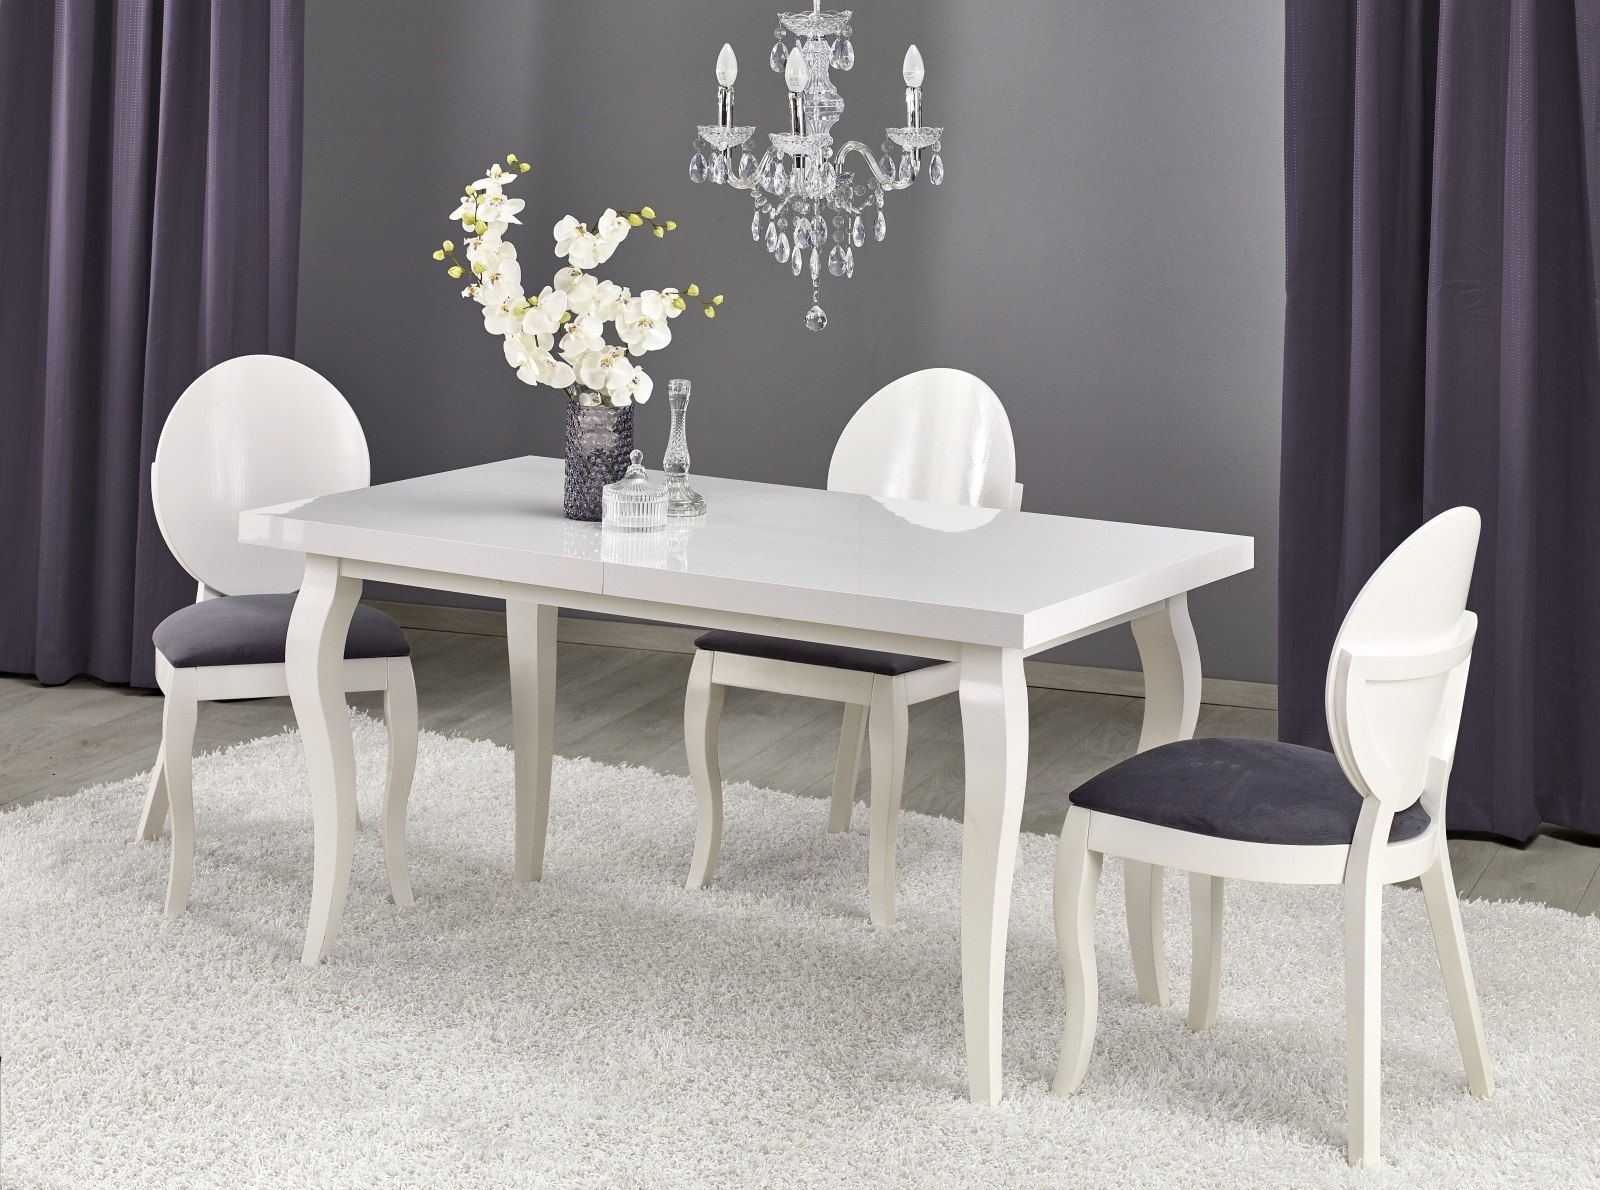 Halmar Jídelní stůl rozkládací MOZART 140/180x80 cm, bílý